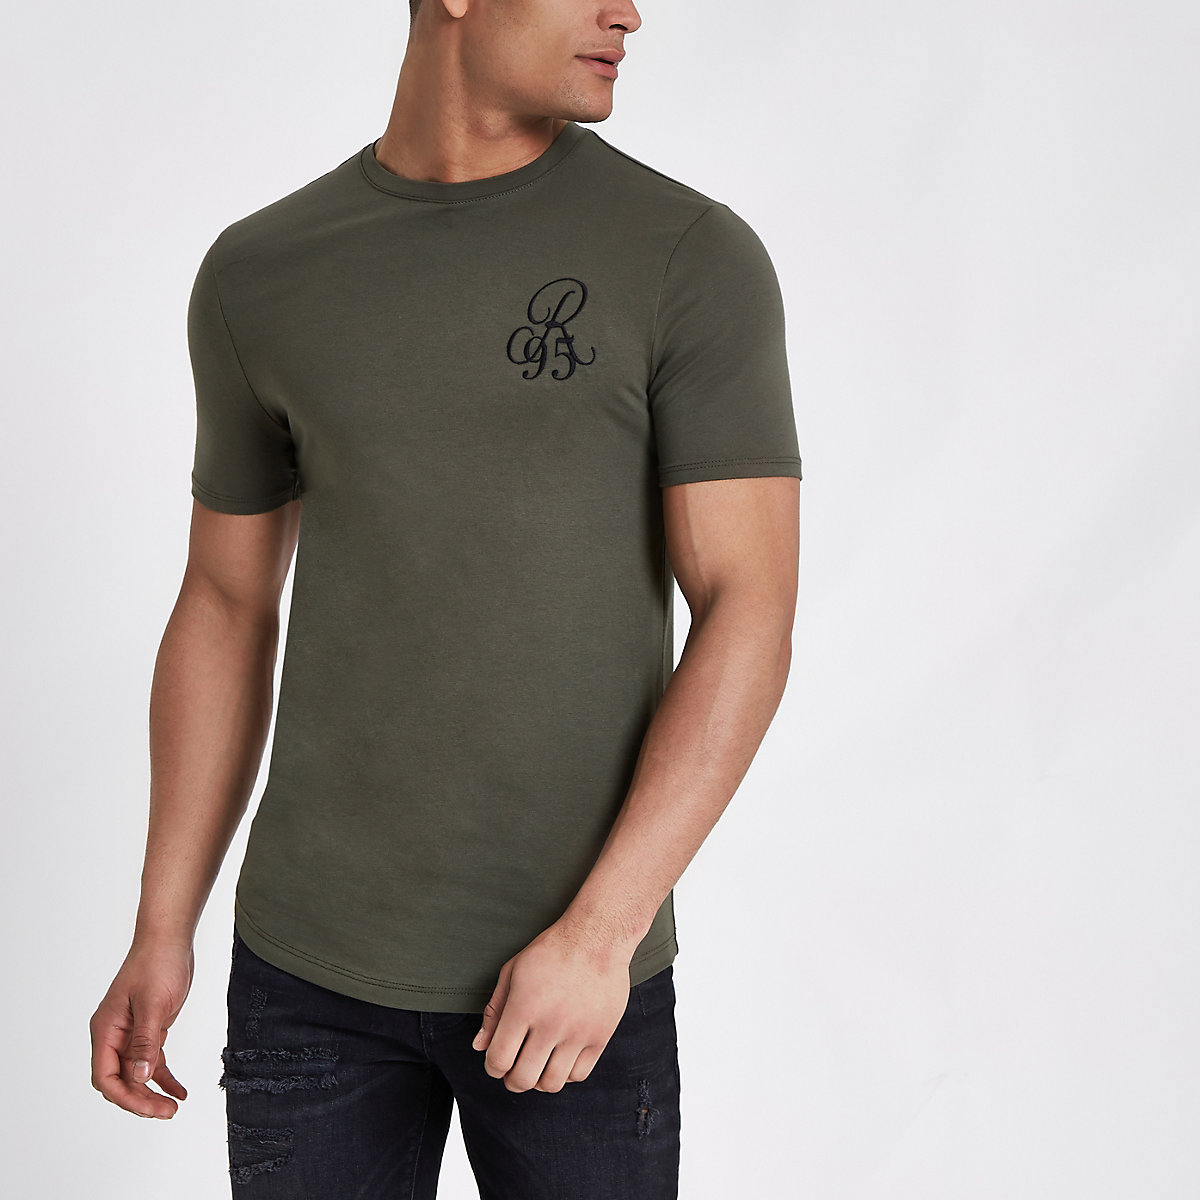 Dark green muscle fit 'R95' T-shirt